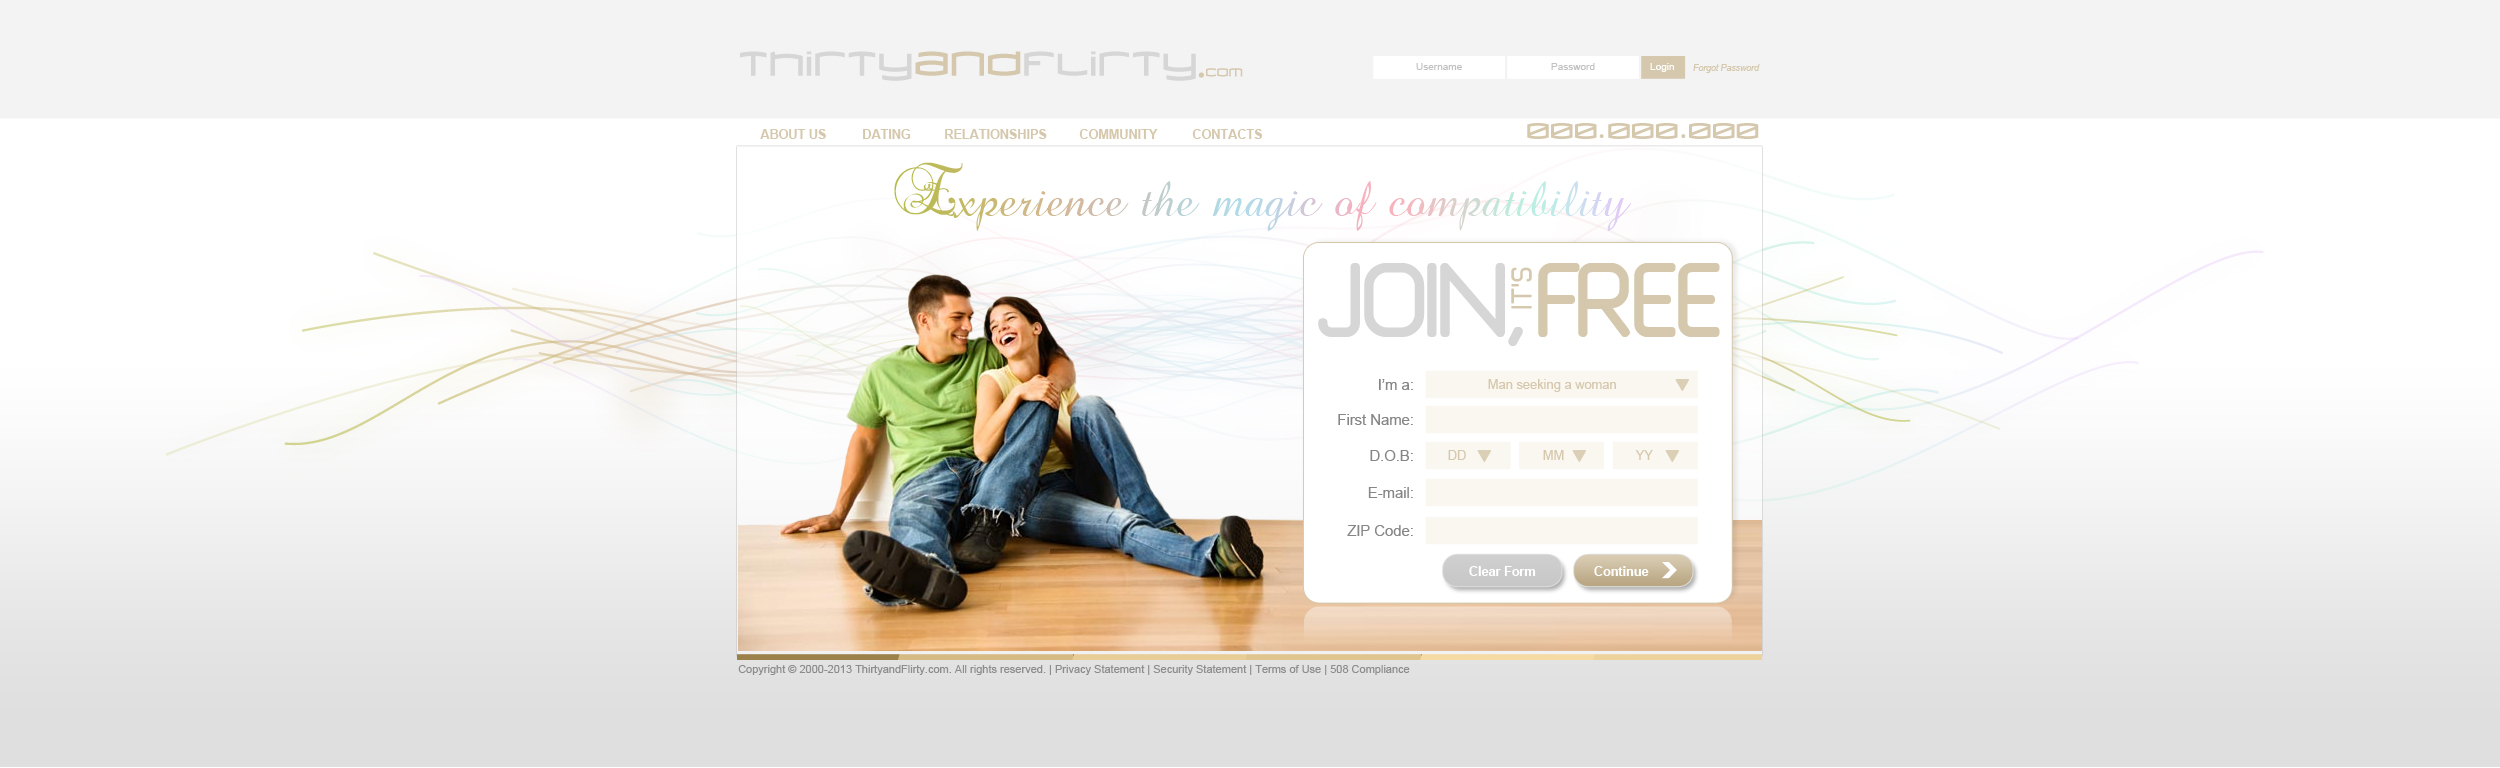 flirty site internet